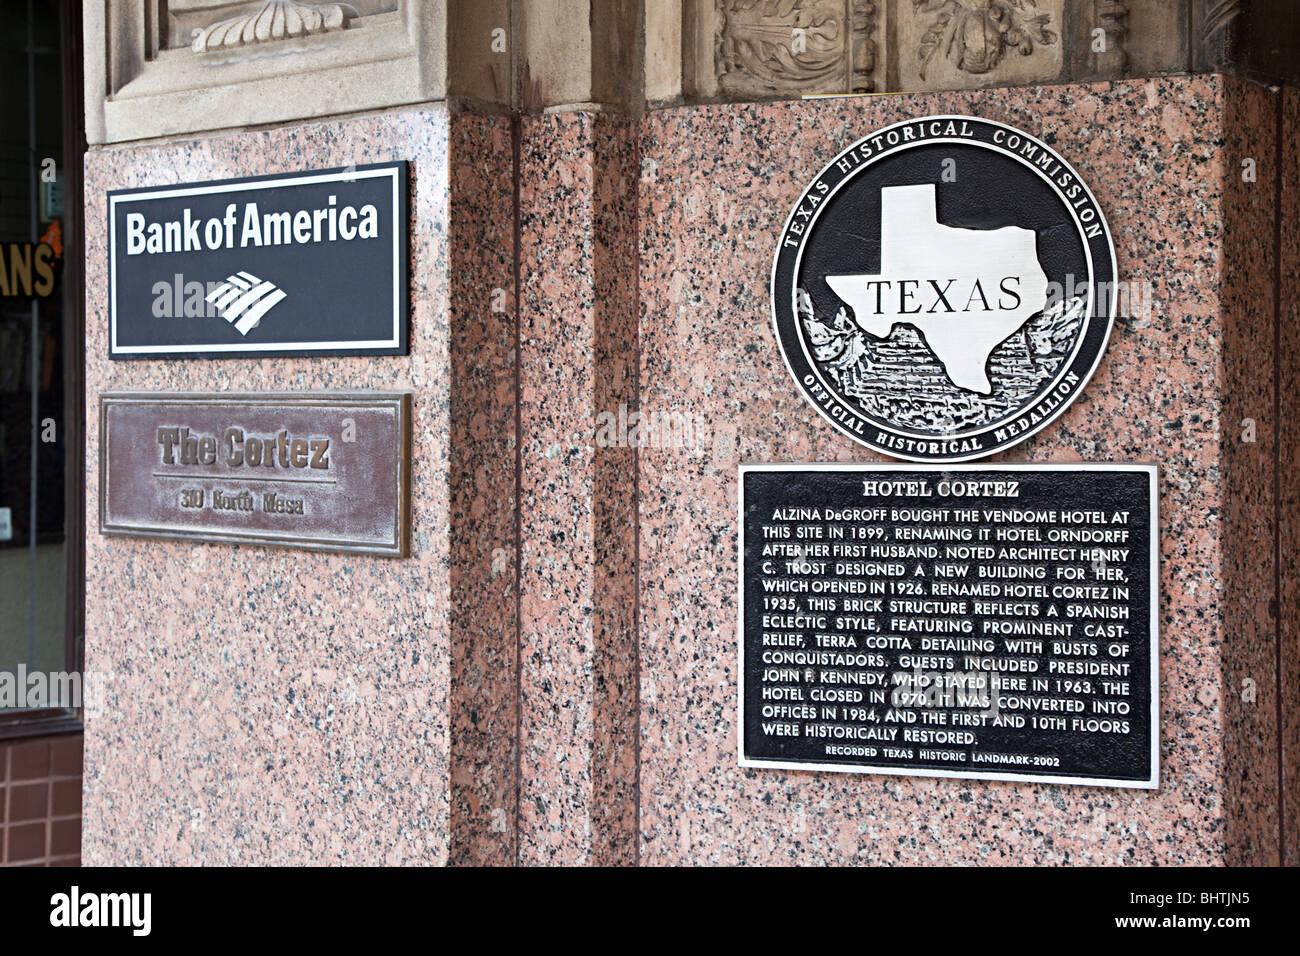 Hotel Cortez Texas Historical Commisson medallion on building wall El Paso Texas USA - Stock Image